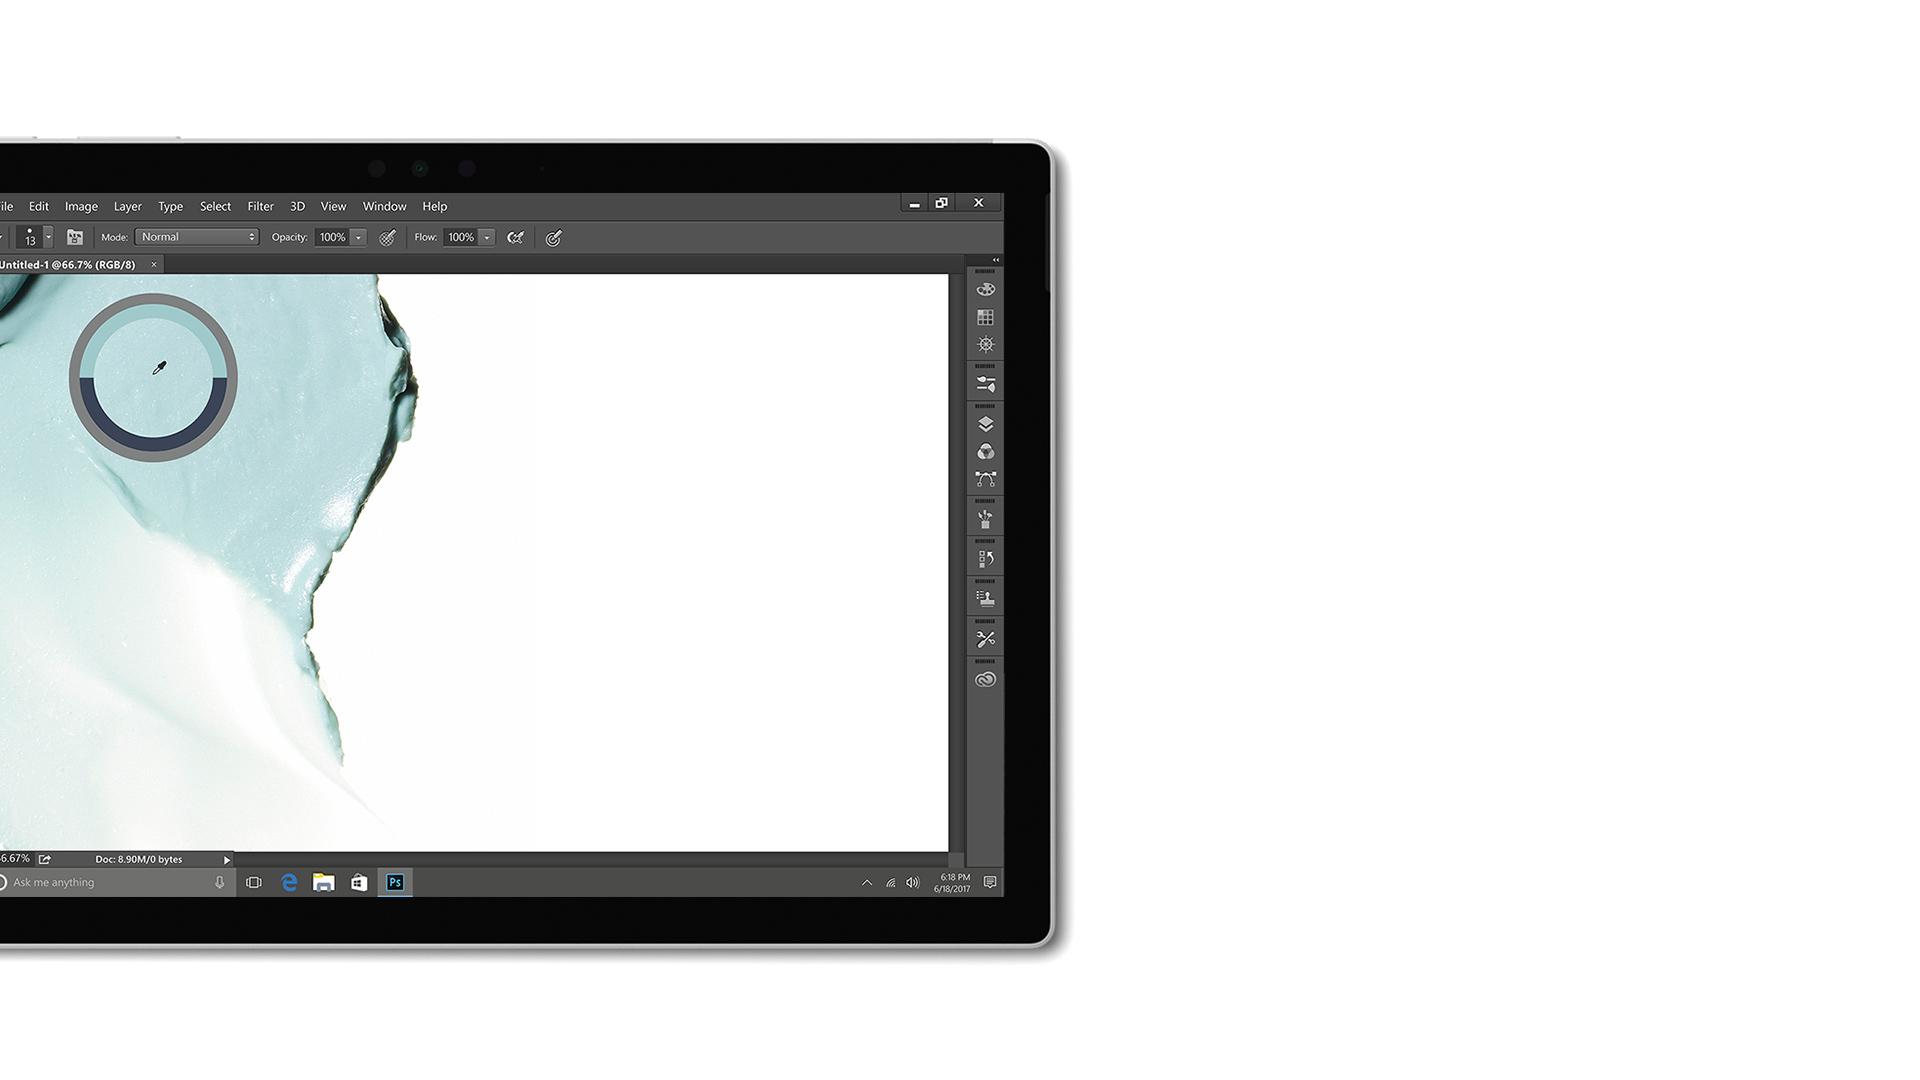 Surface 上の Creative Cloud スクリーンショット。